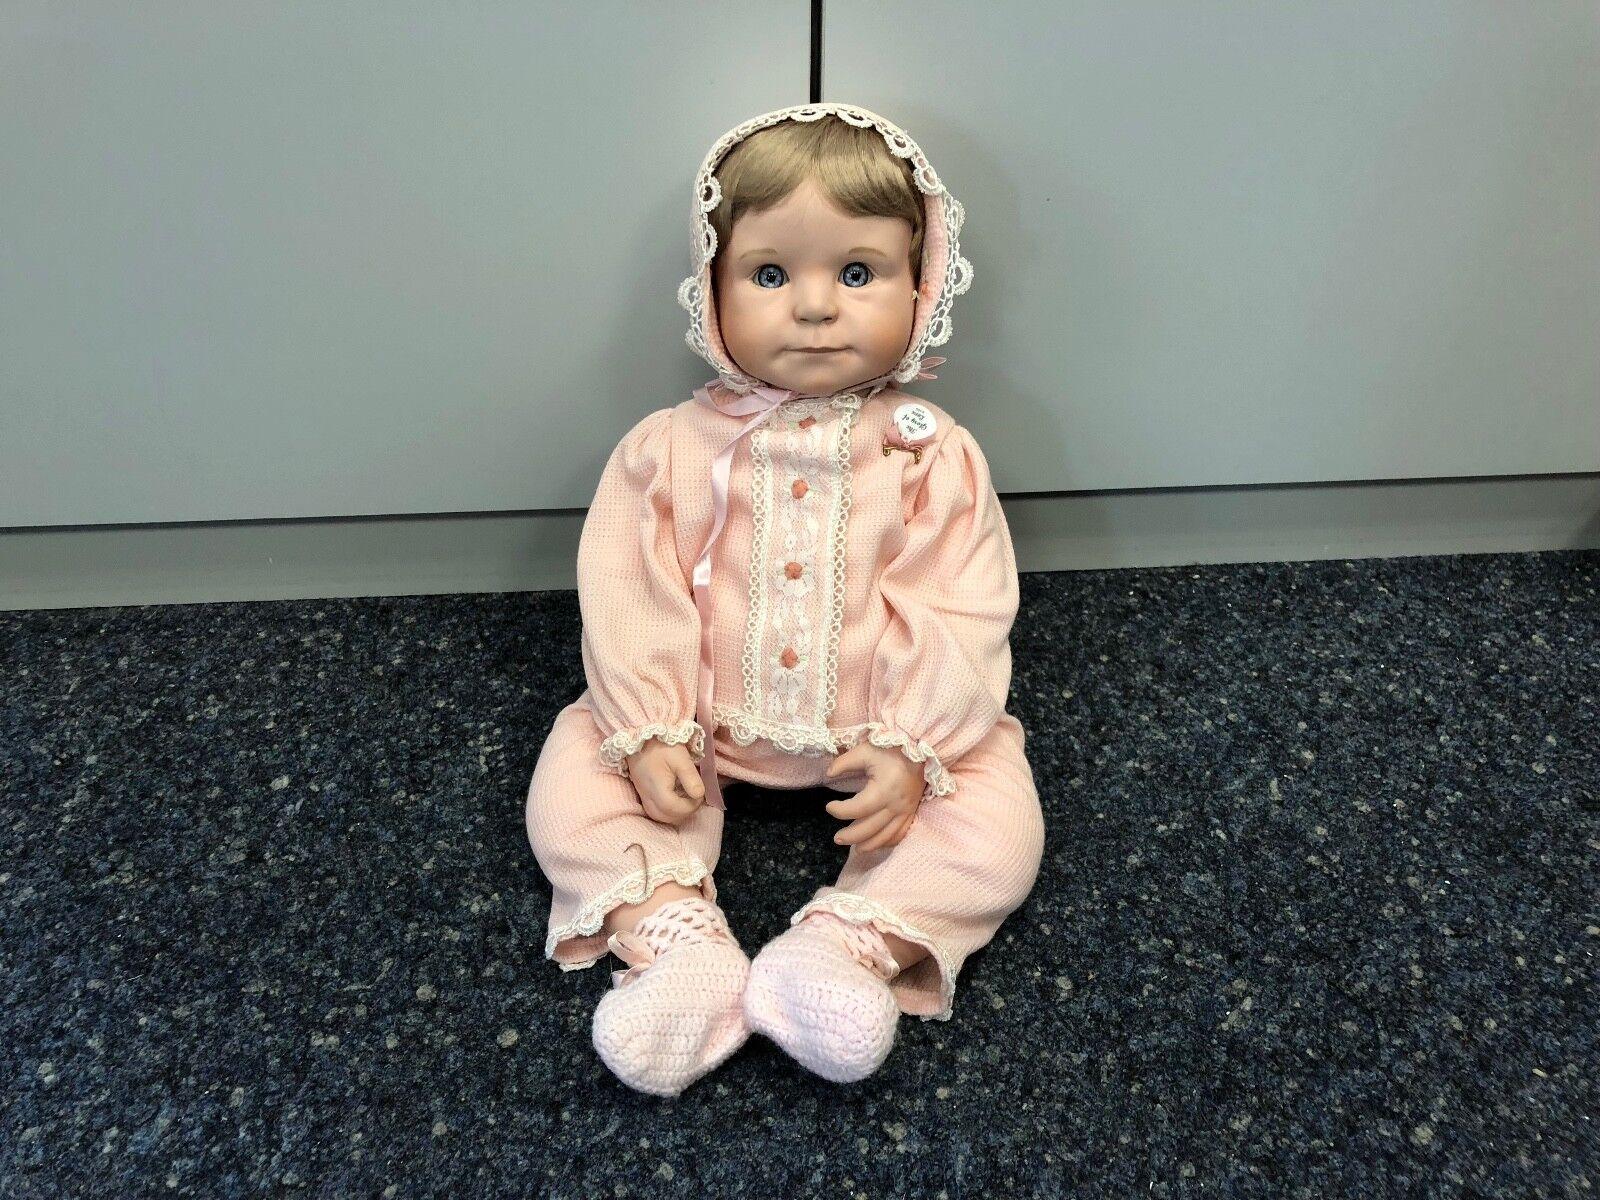 Yolanda bello vinile bambola 62 CM. OTTIMO stato